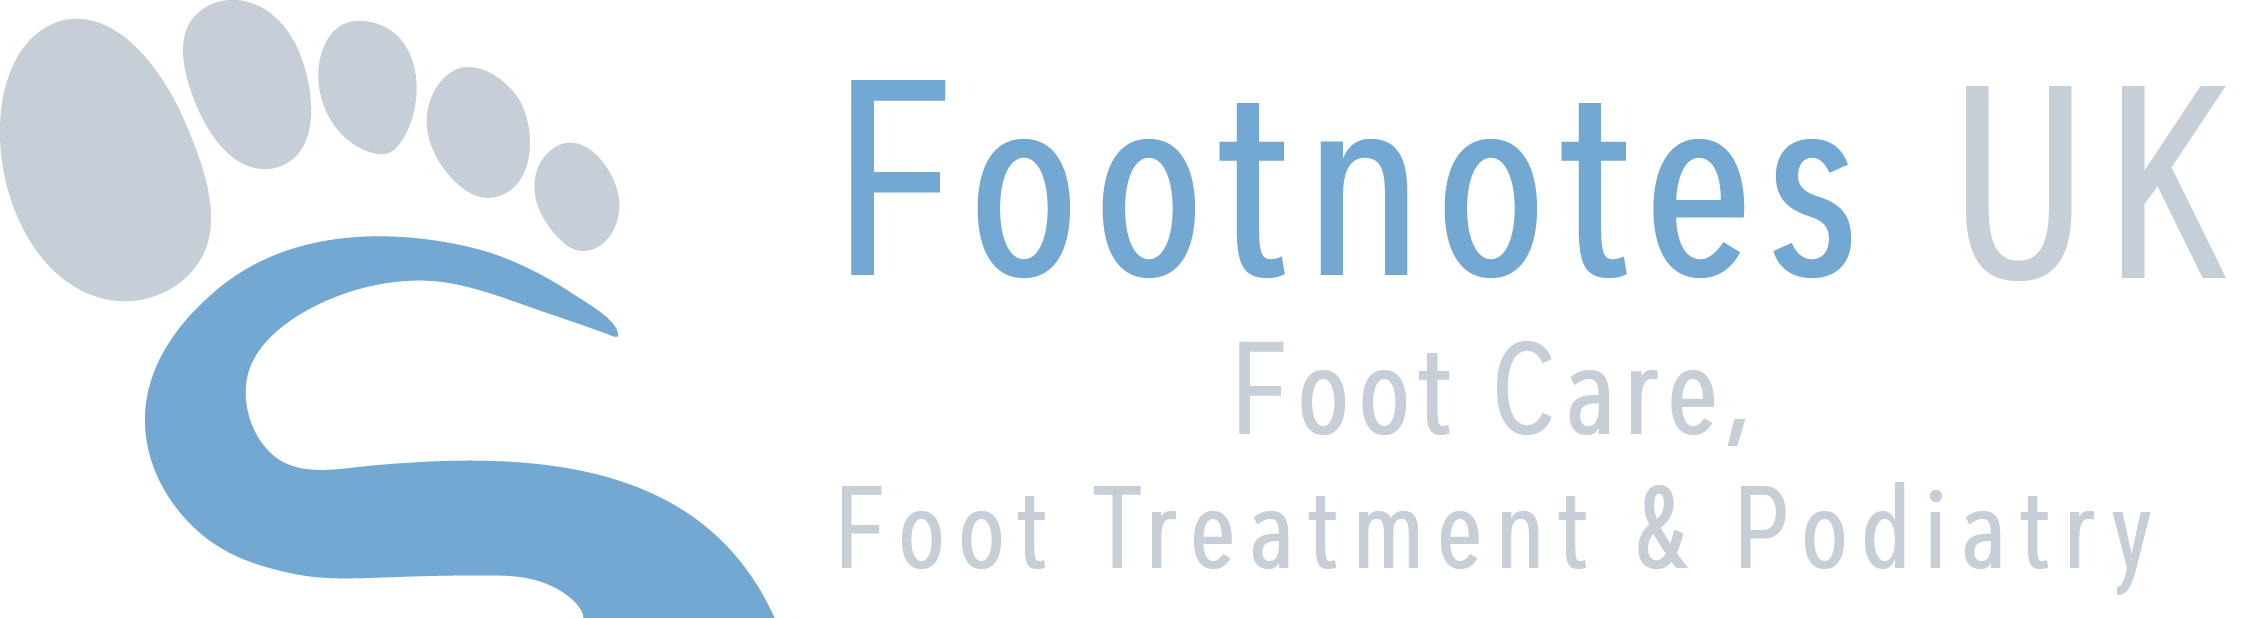 Footnotes Uk